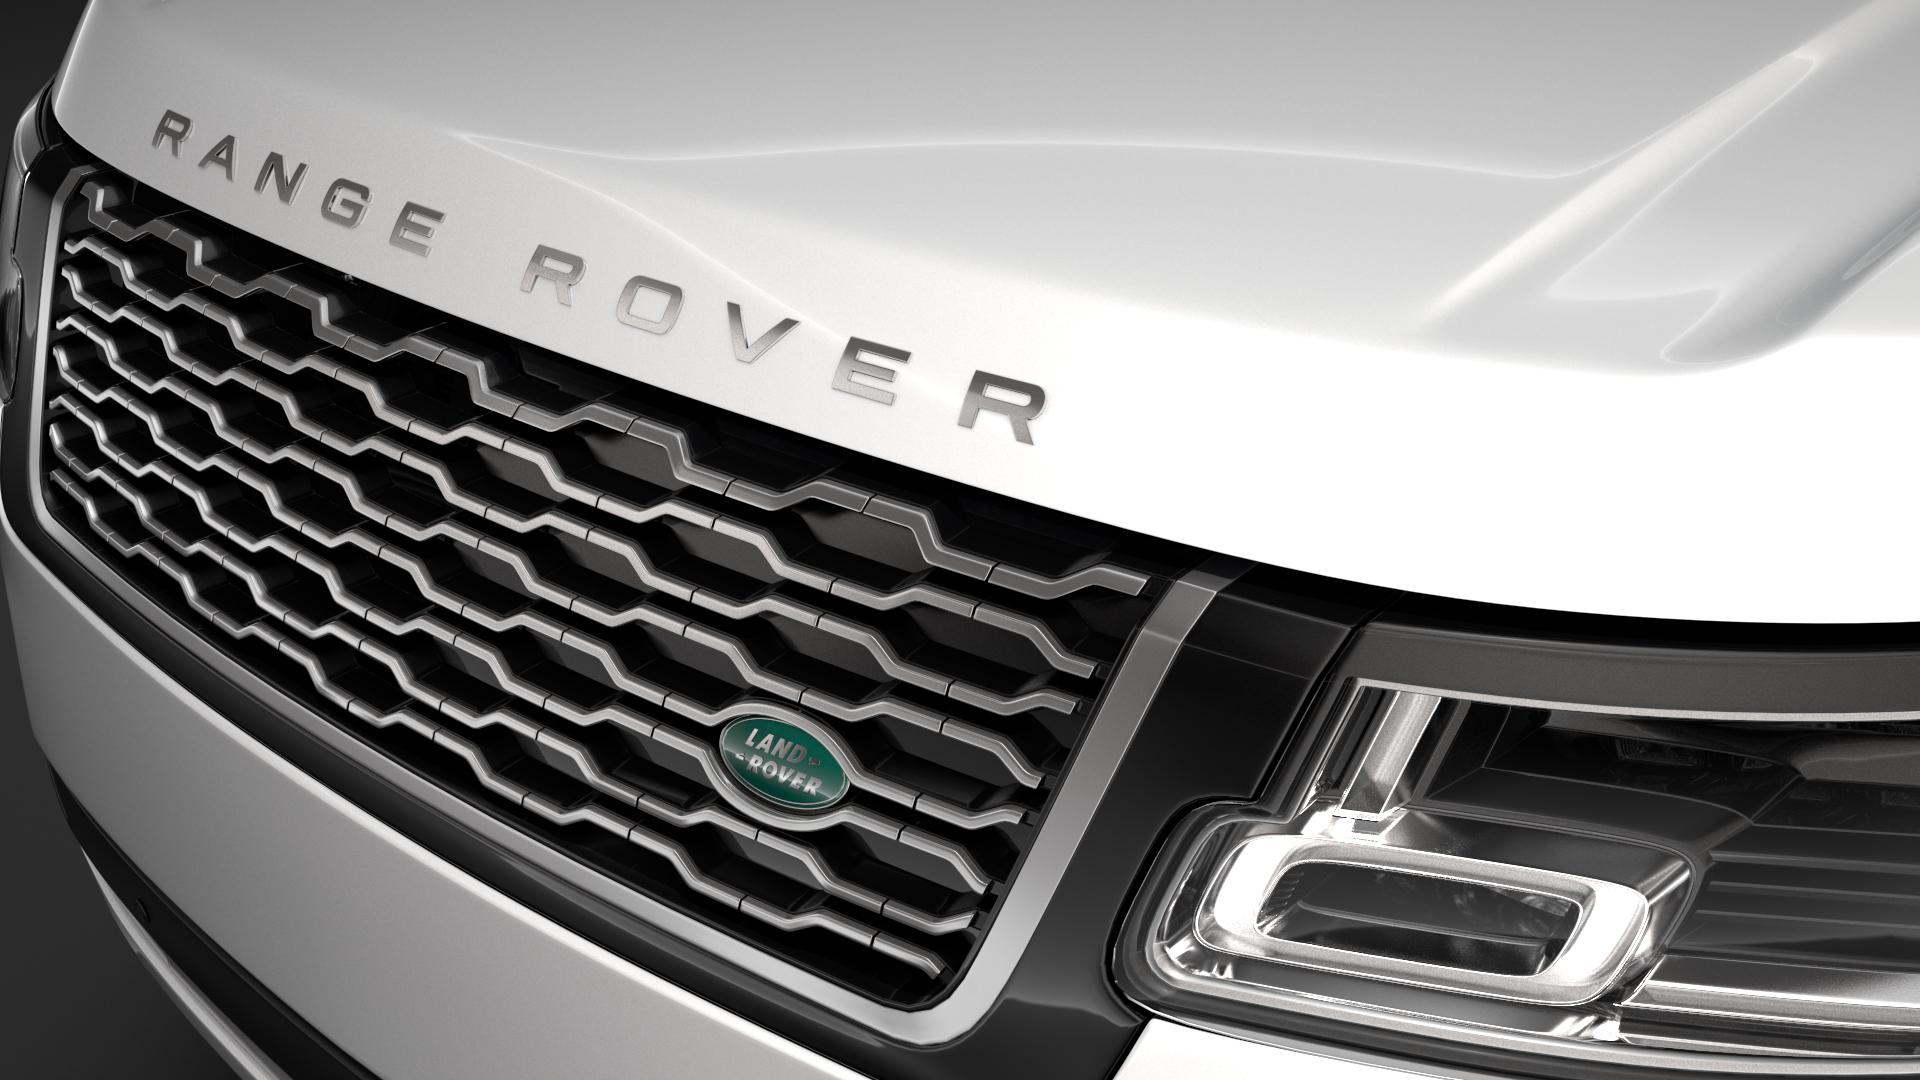 range rover autobiography p400e lwb l405 2018 3d model fbx c4d lwo ma mb hrc xsi obj 277353